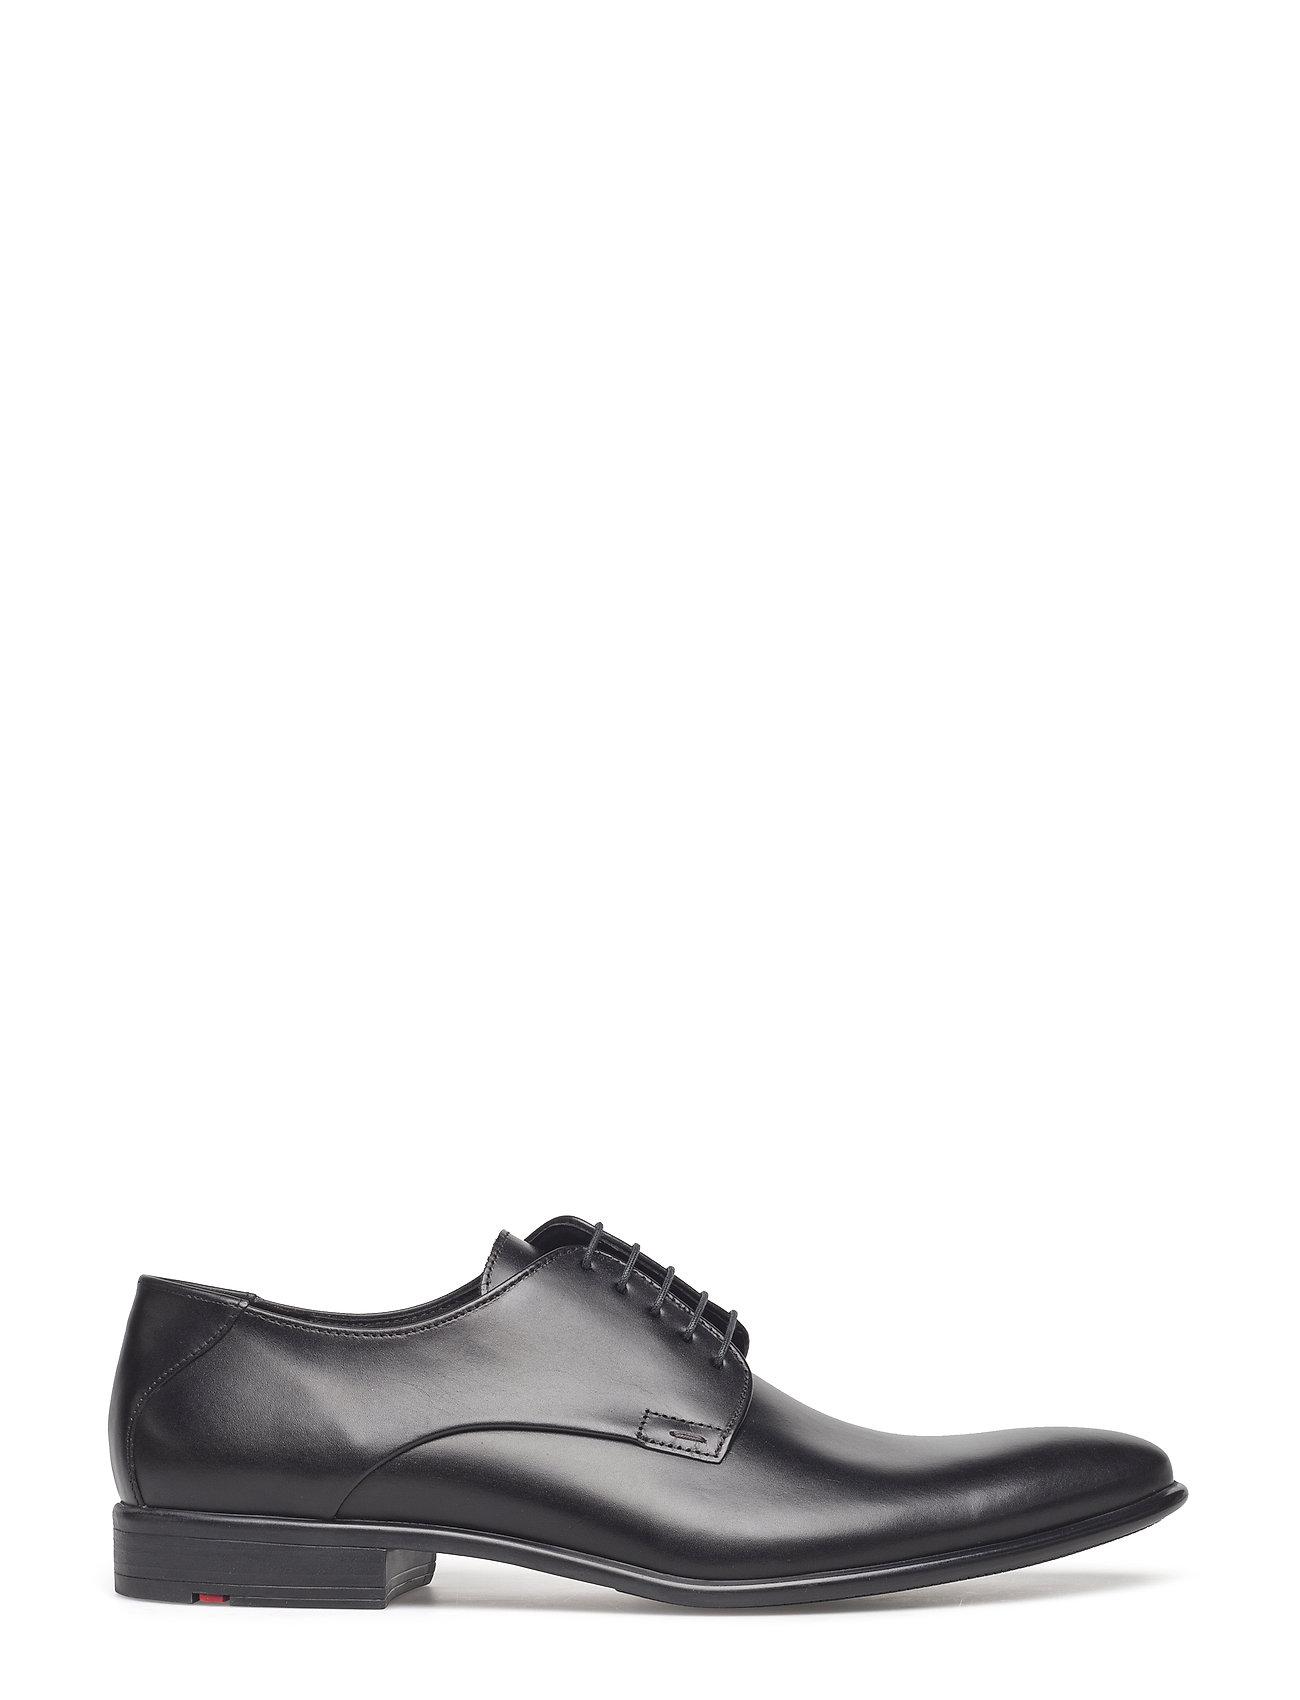 Nik Shoes Business Laced Shoes Sort Lloyd